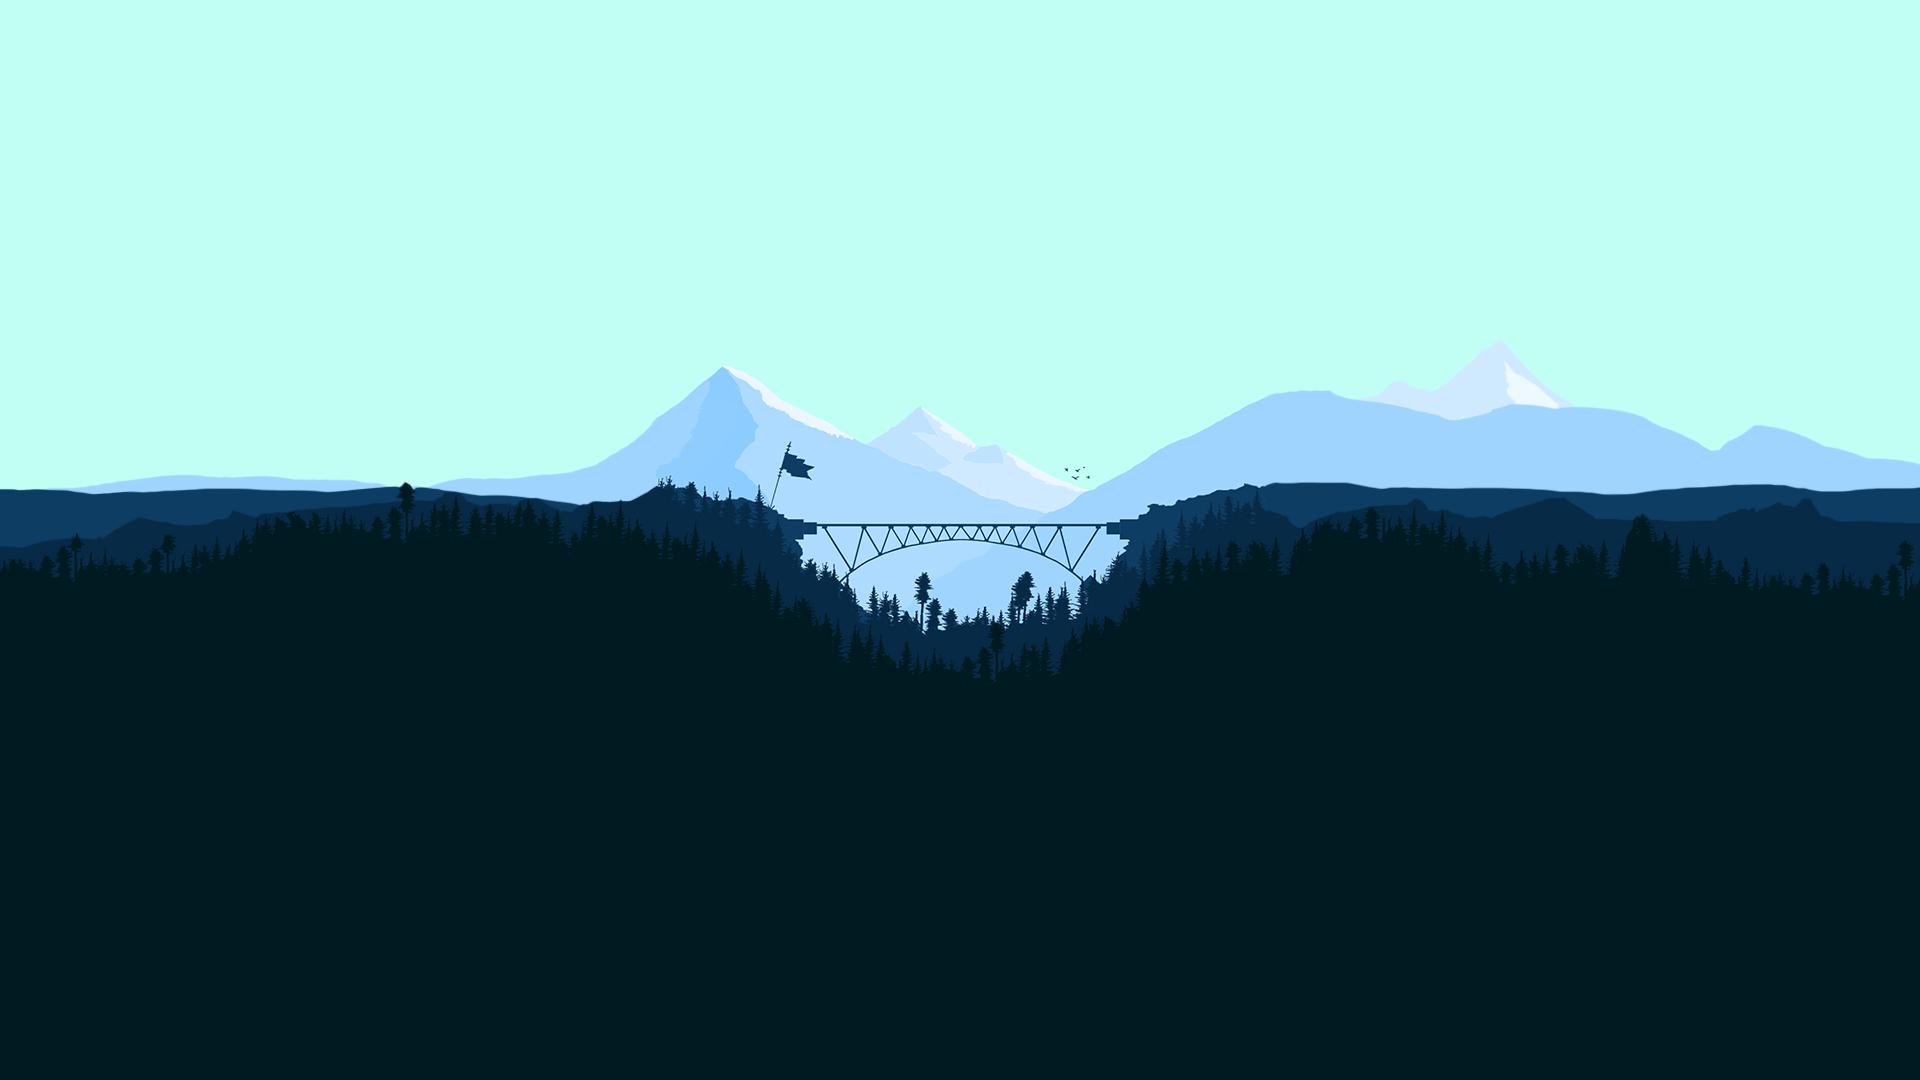 Minimalism Mountain Peak Full Hd Wallpaper: Wallpaper : Fkyhdino, Landscape, Artwork, Mountains